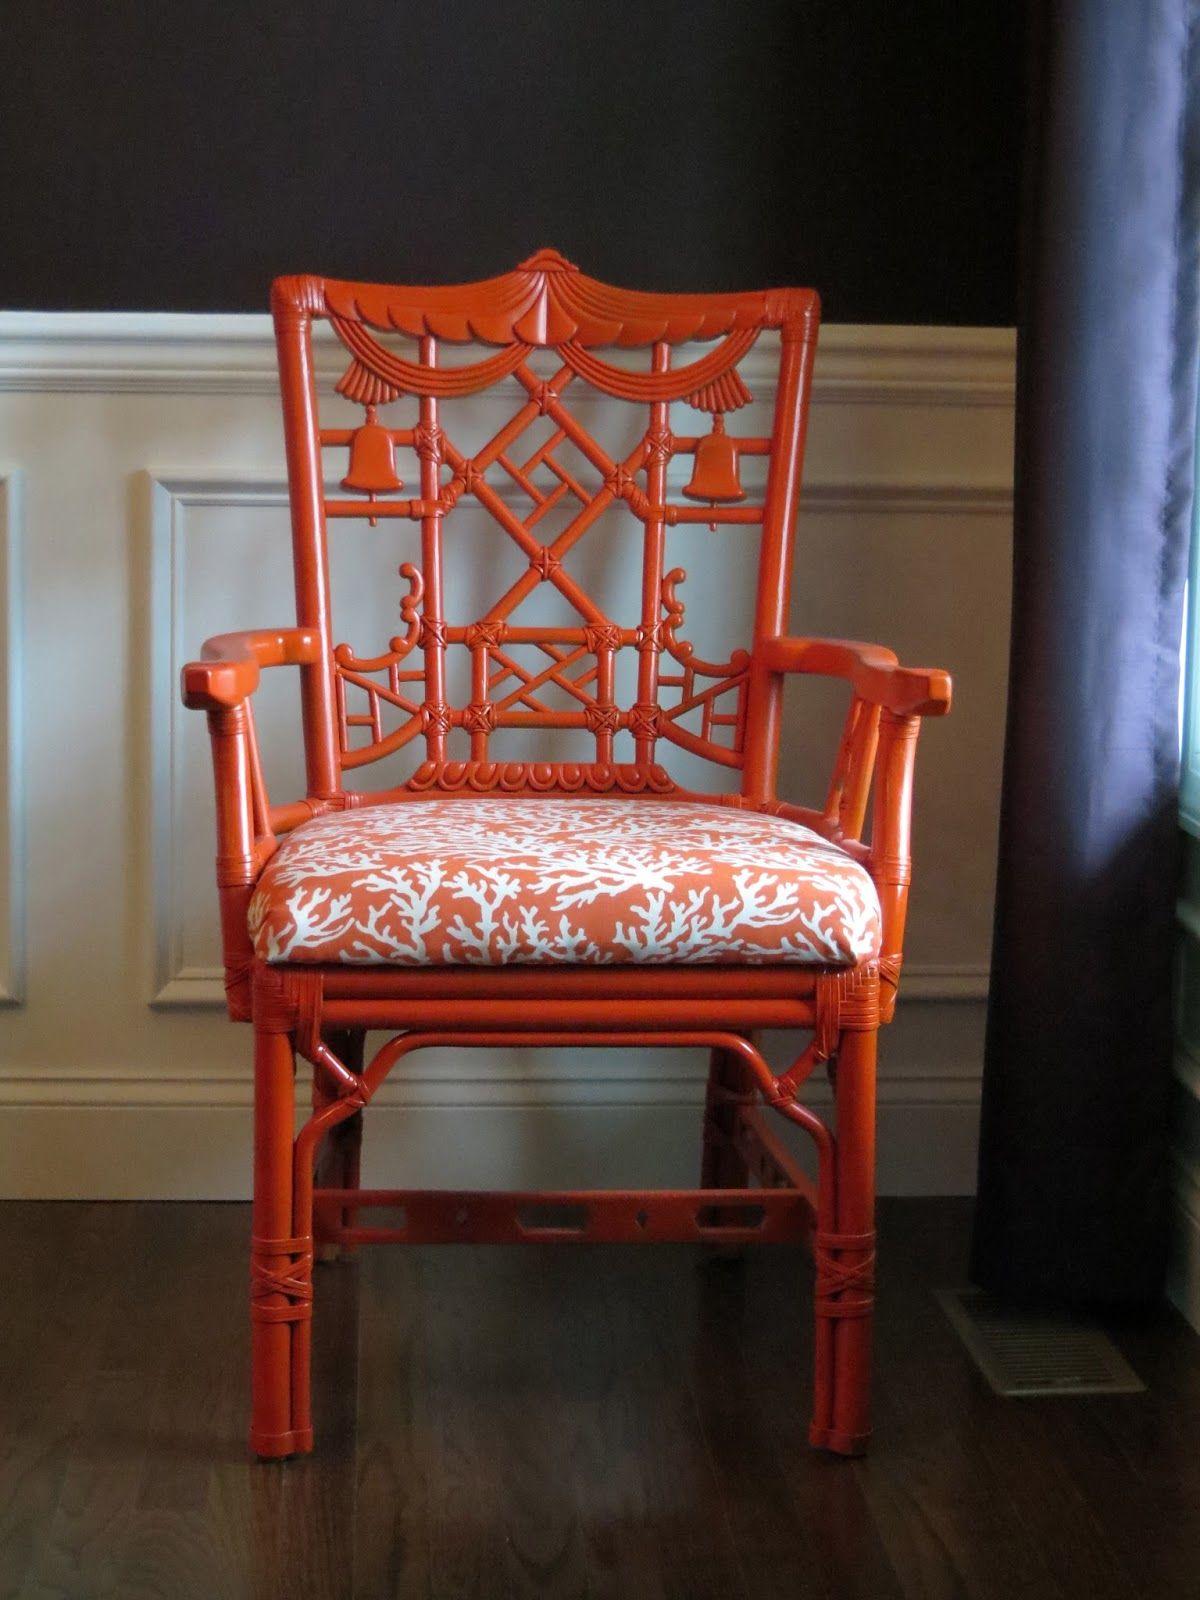 orange chair salon heel sofa chinoiserie chic amazing craigslist find